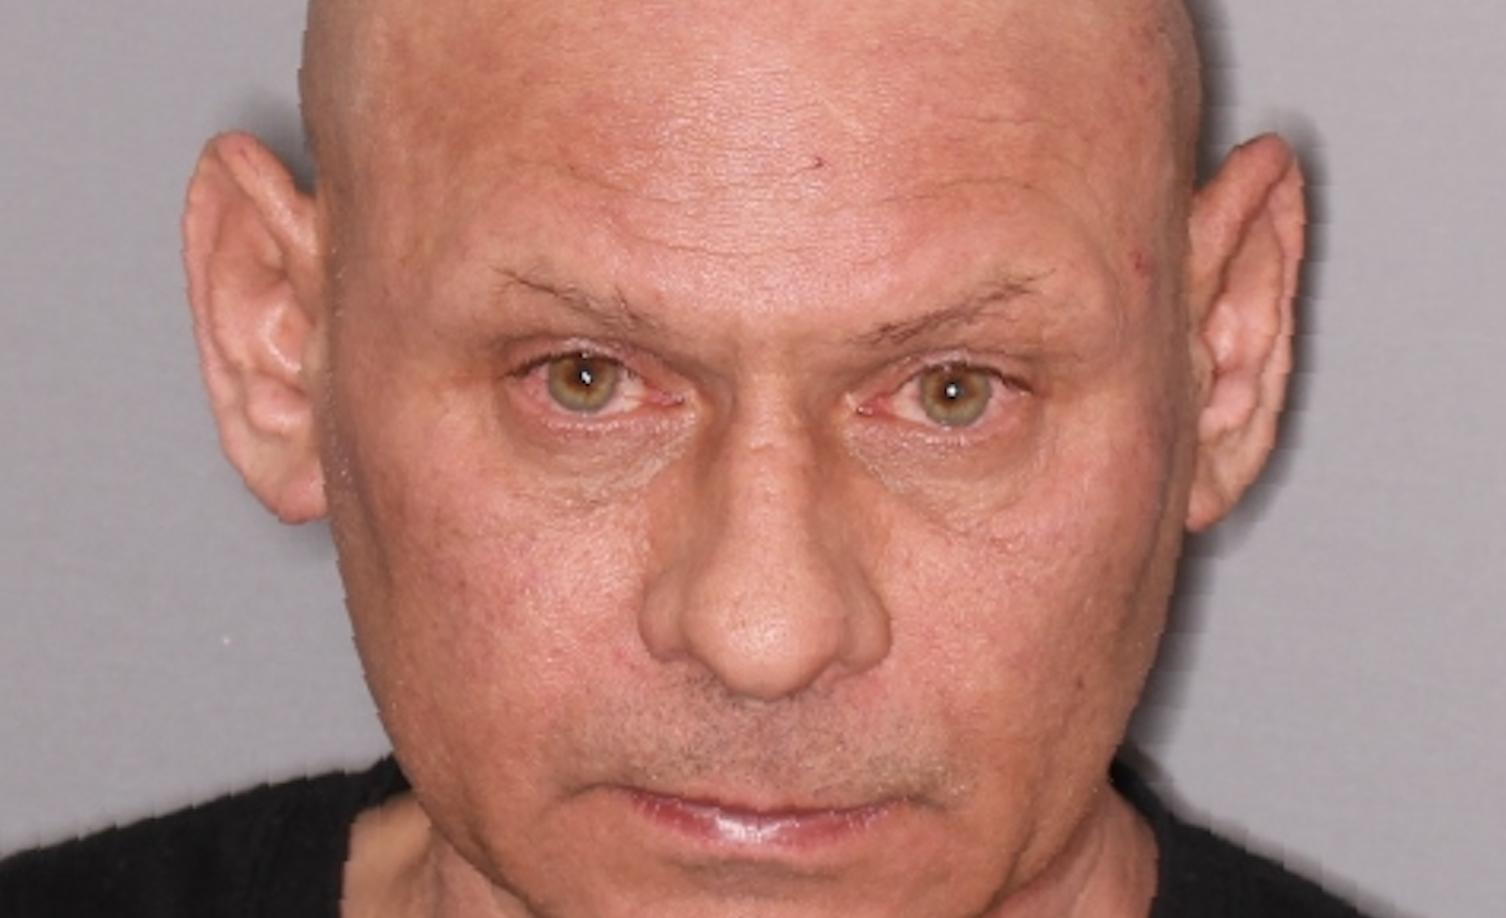 Police: Seneca Falls man hit probation officer, then kicked responding police officer